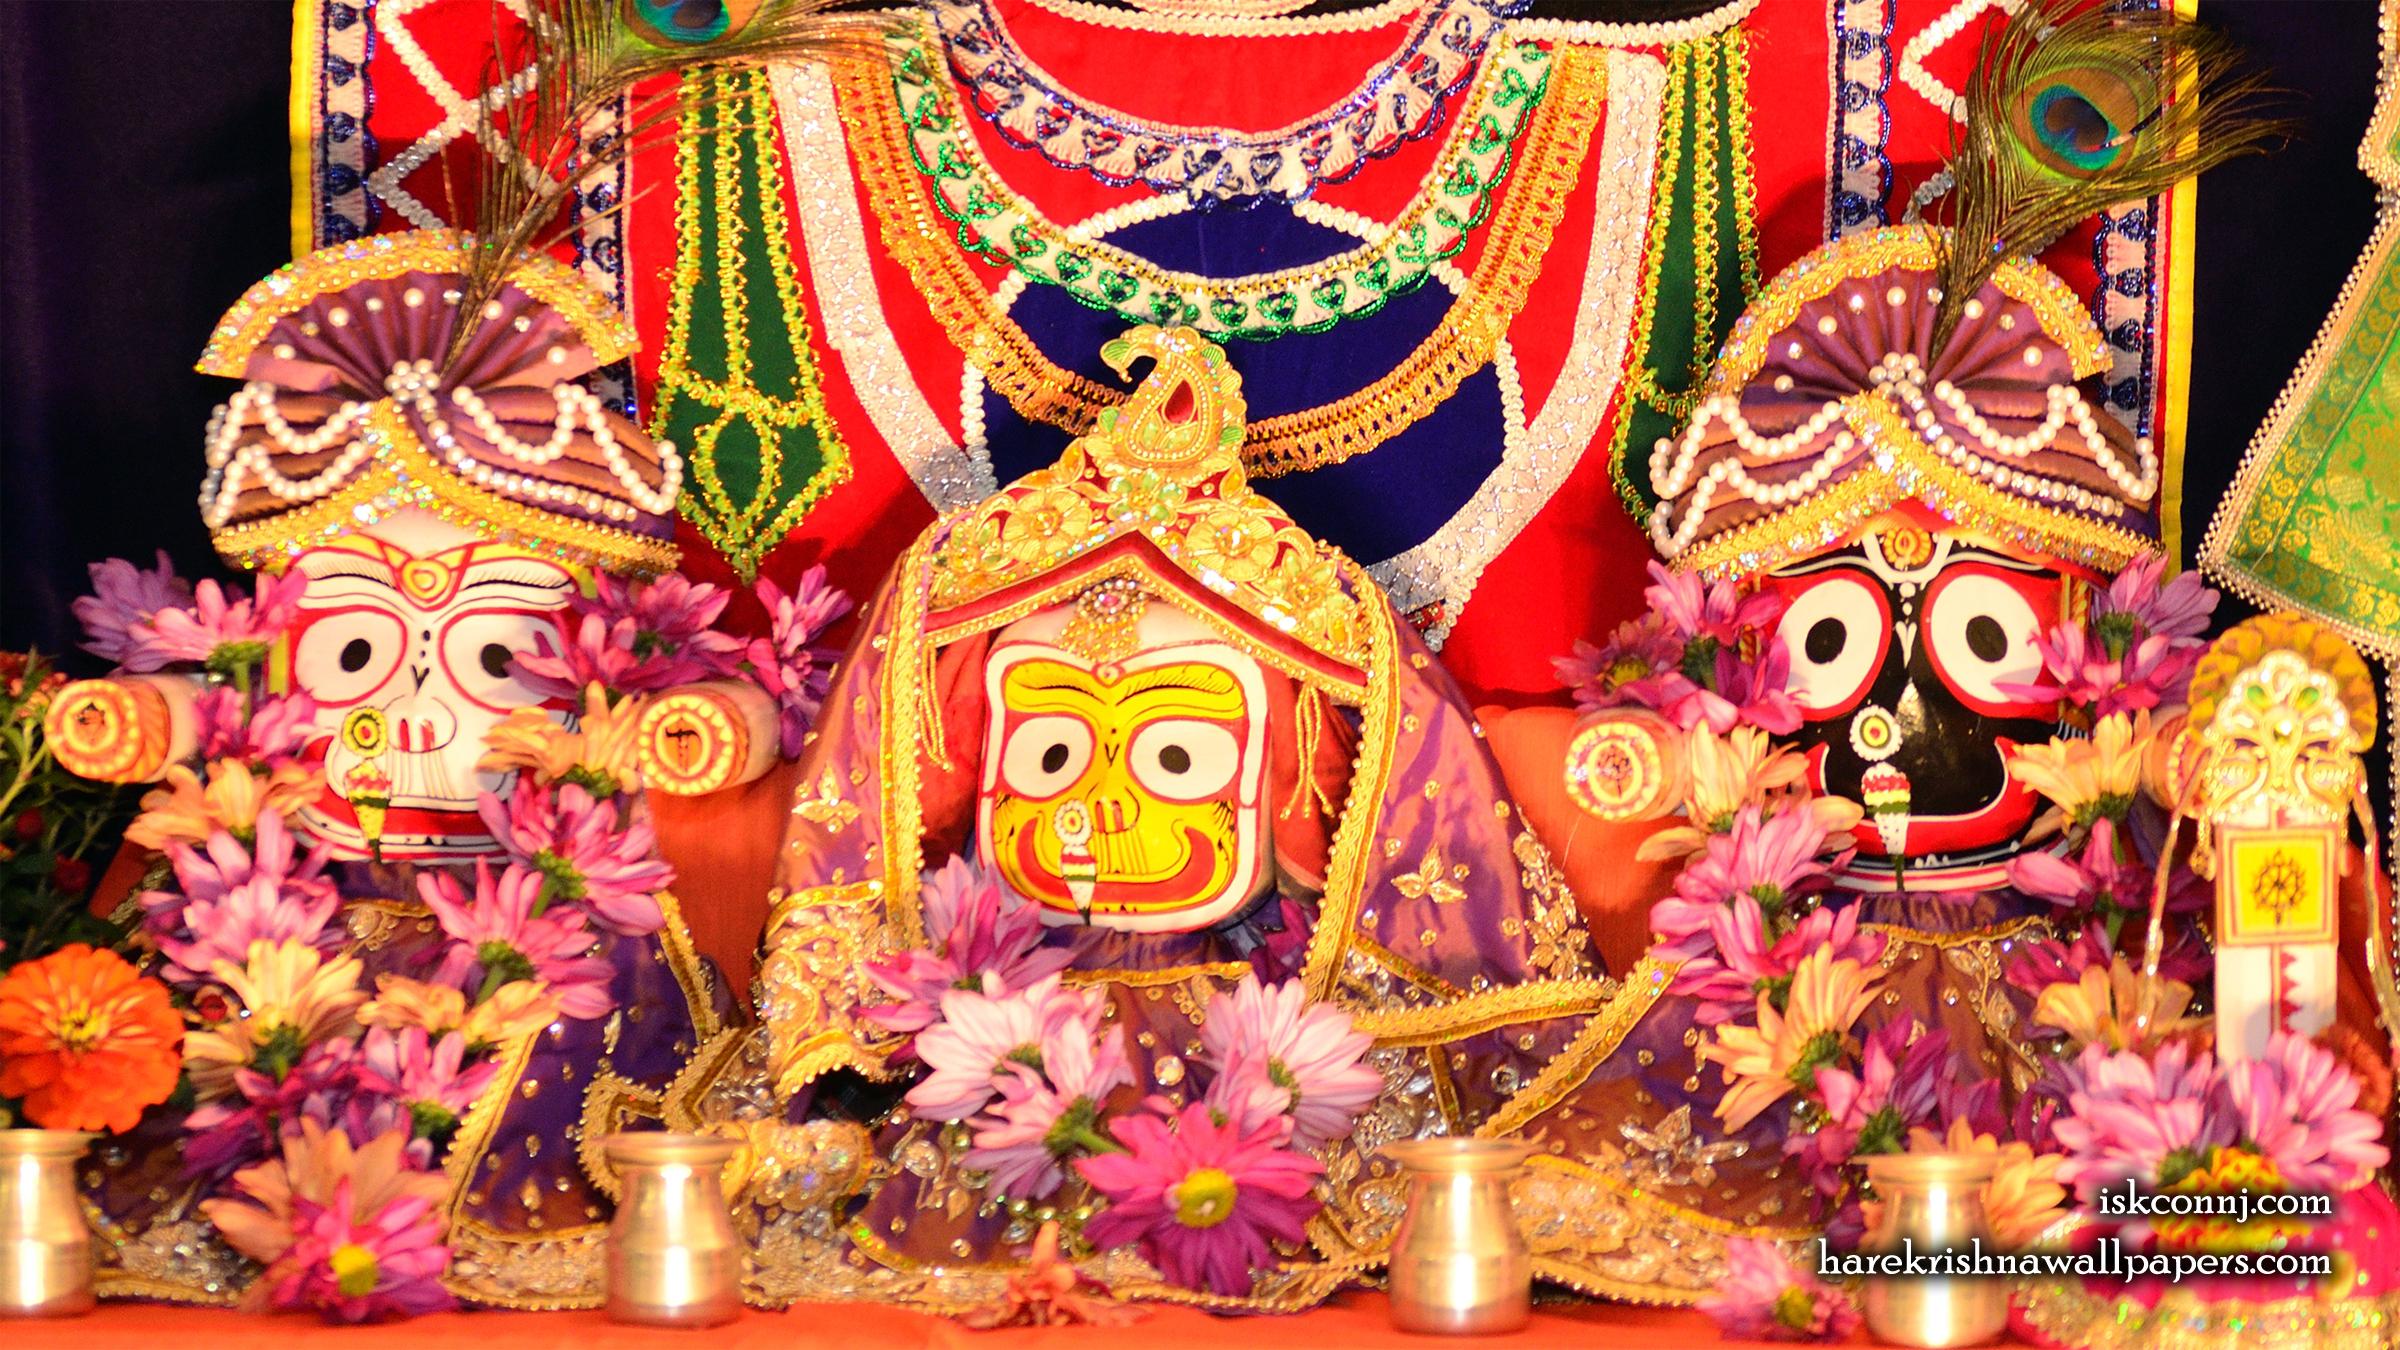 Jagannath Baladeva Subhadra Wallpaper (002) Size 2400x1350 Download